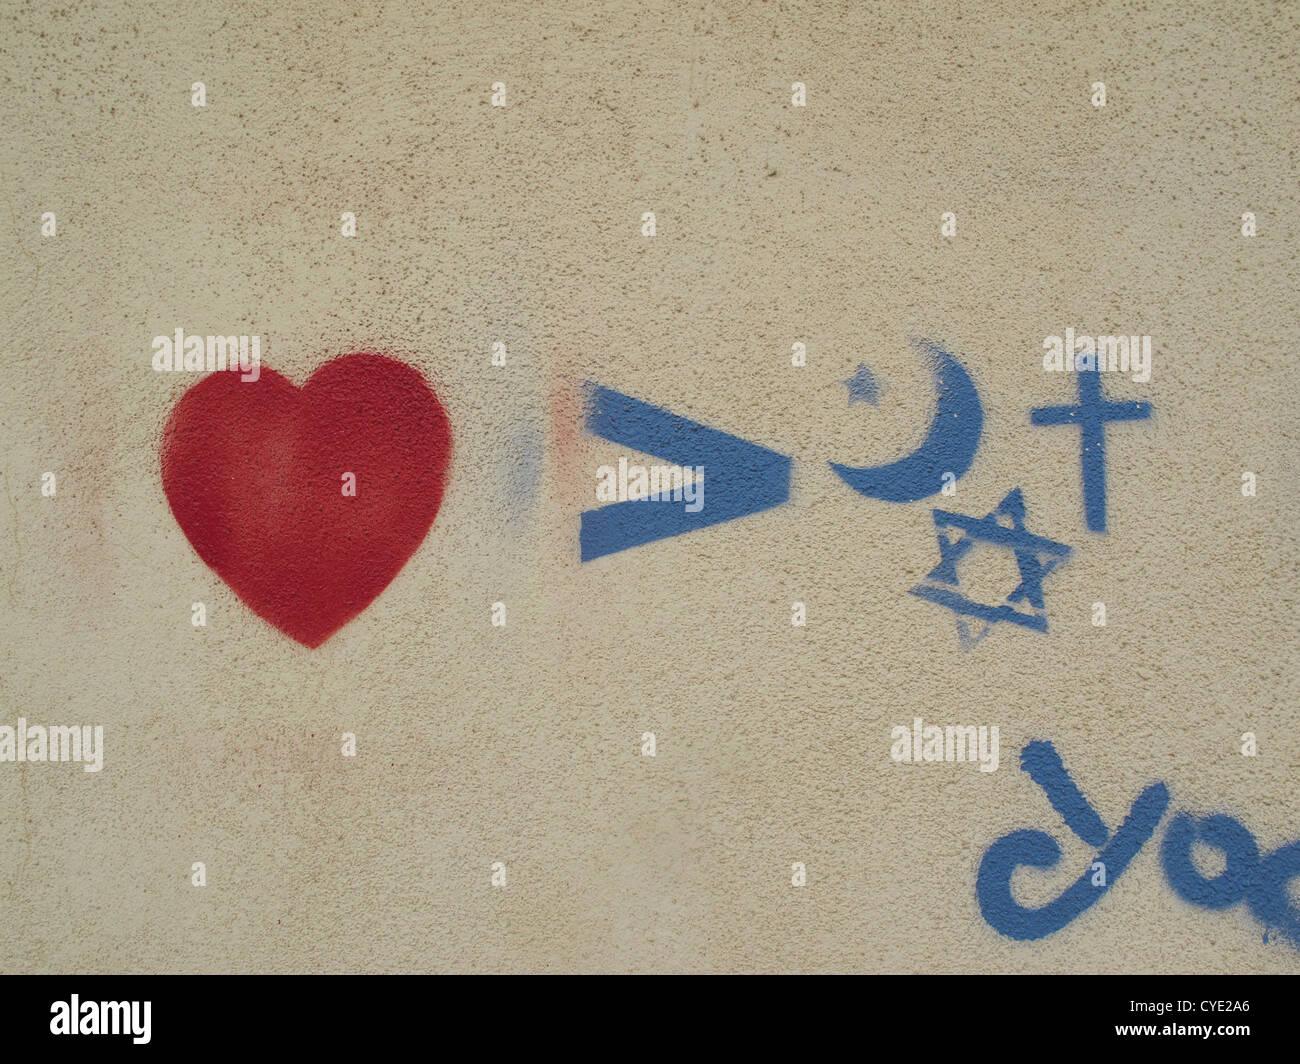 Jewish Christian Muslim Symbol Stock Photos Jewish Christian